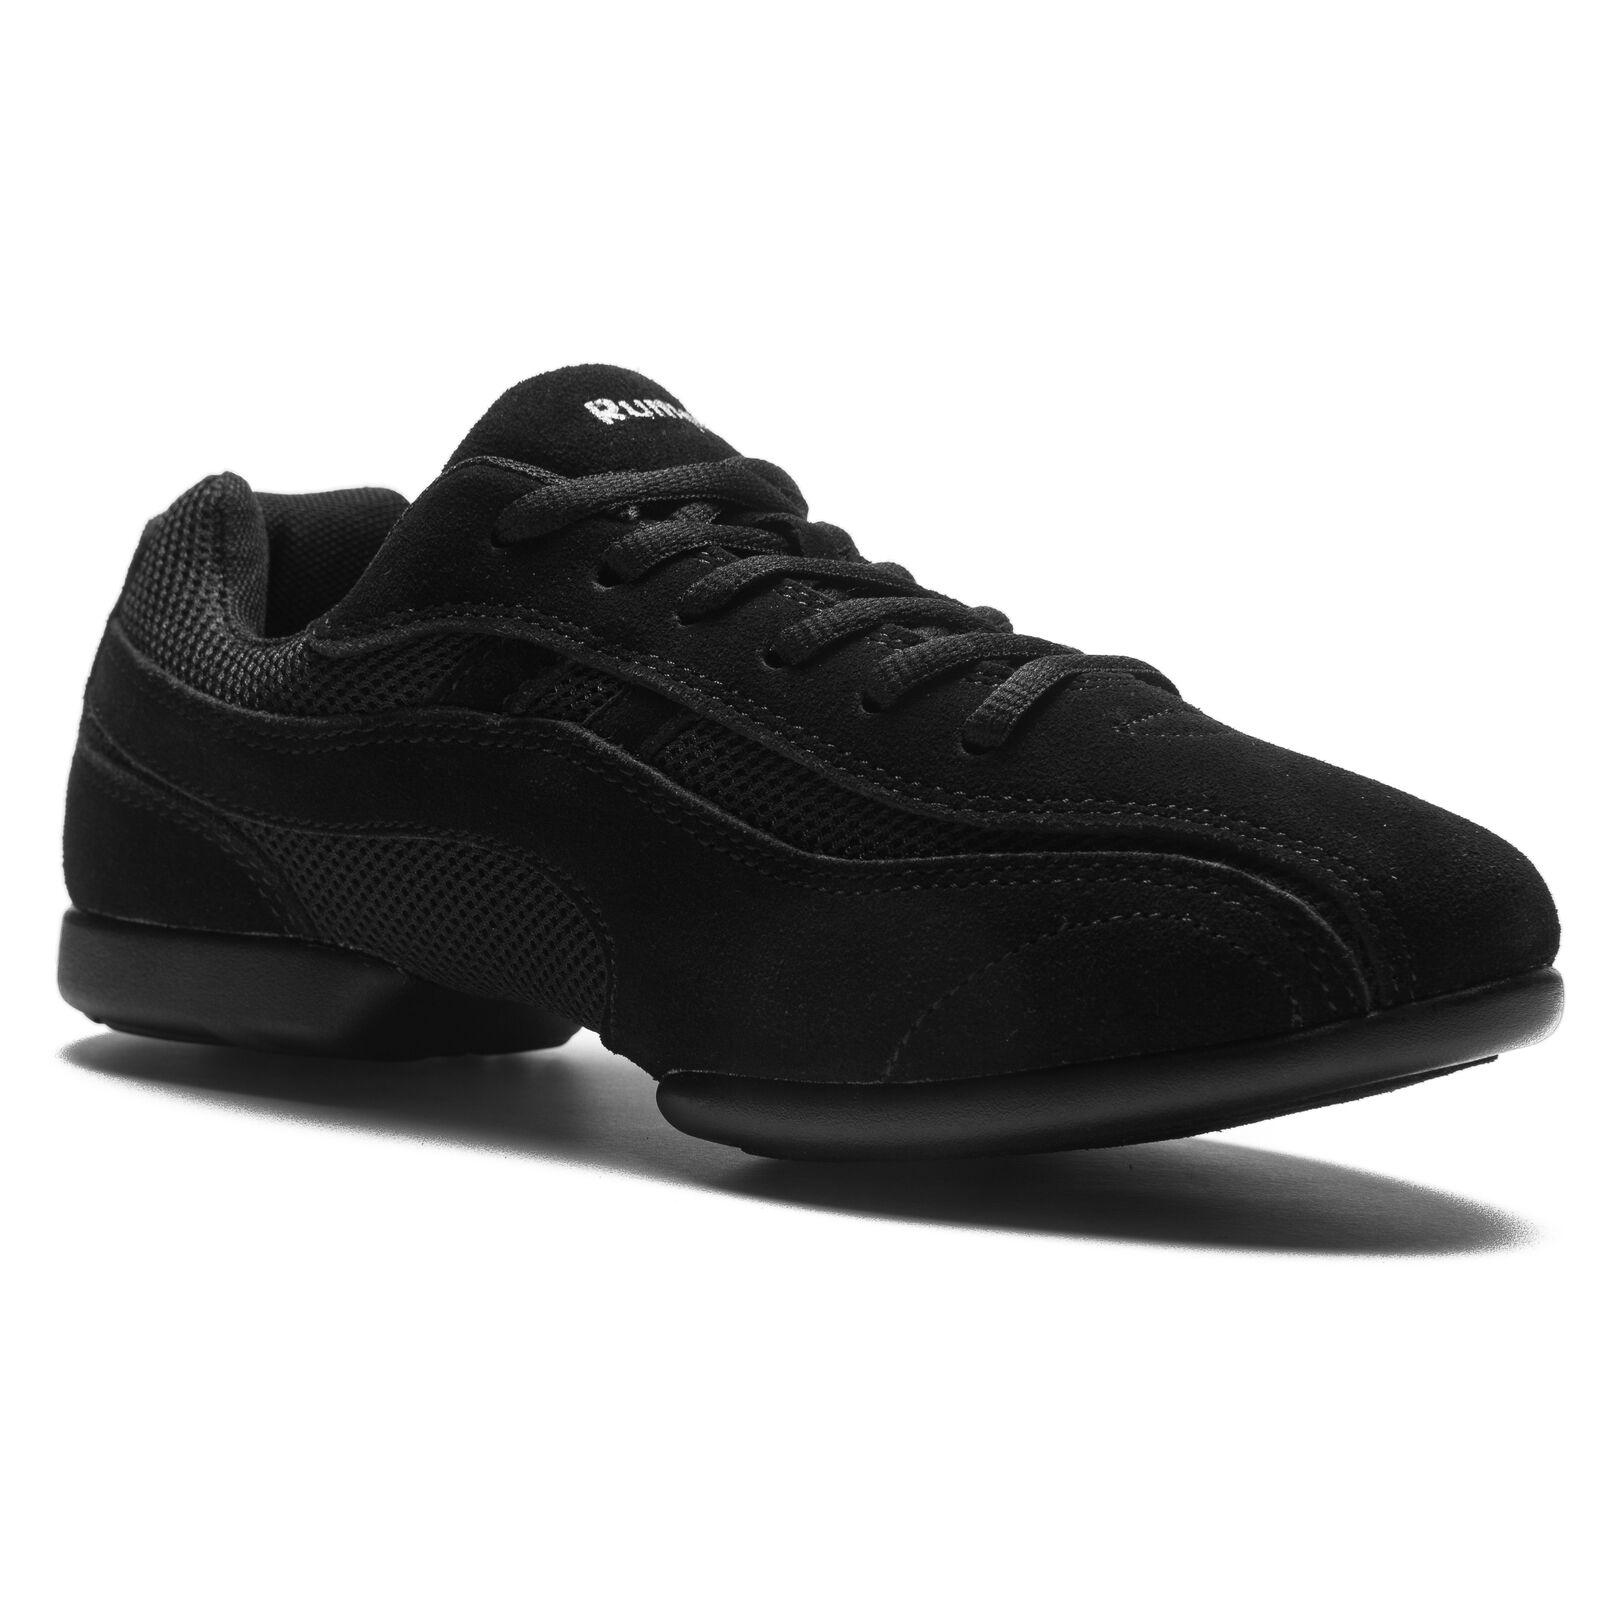 Rumpf 1592 Jive Tanz Dance Sport Turnschuhe Hip Lindy Hop Trainings Schuhe schwarz